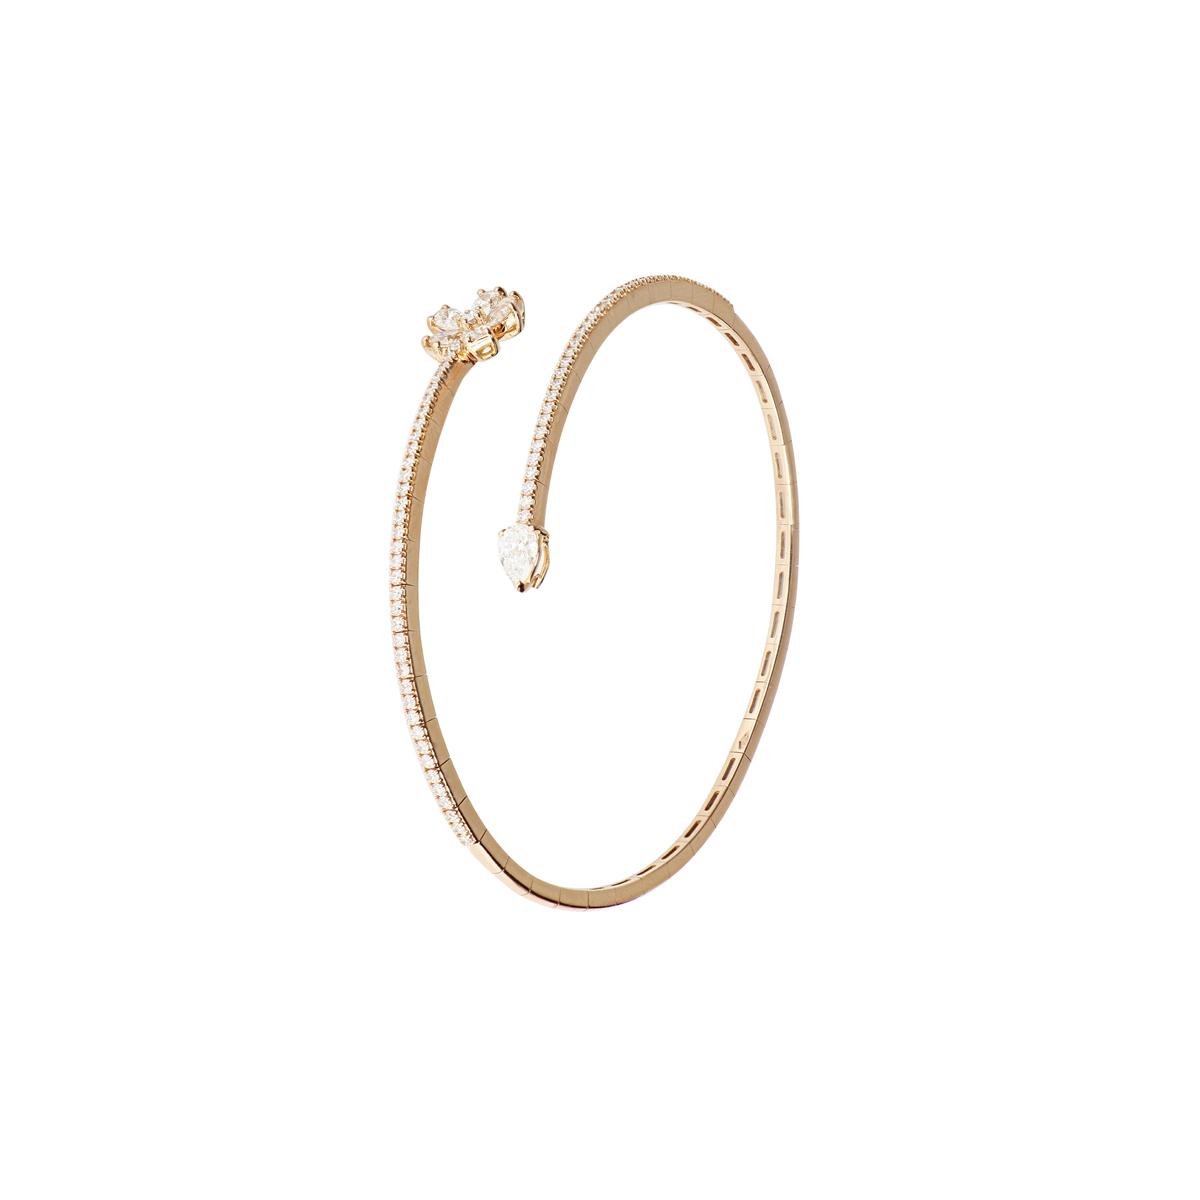 Yellow Gold, Open Cuff Bangle Bracelet with Diamond Flower